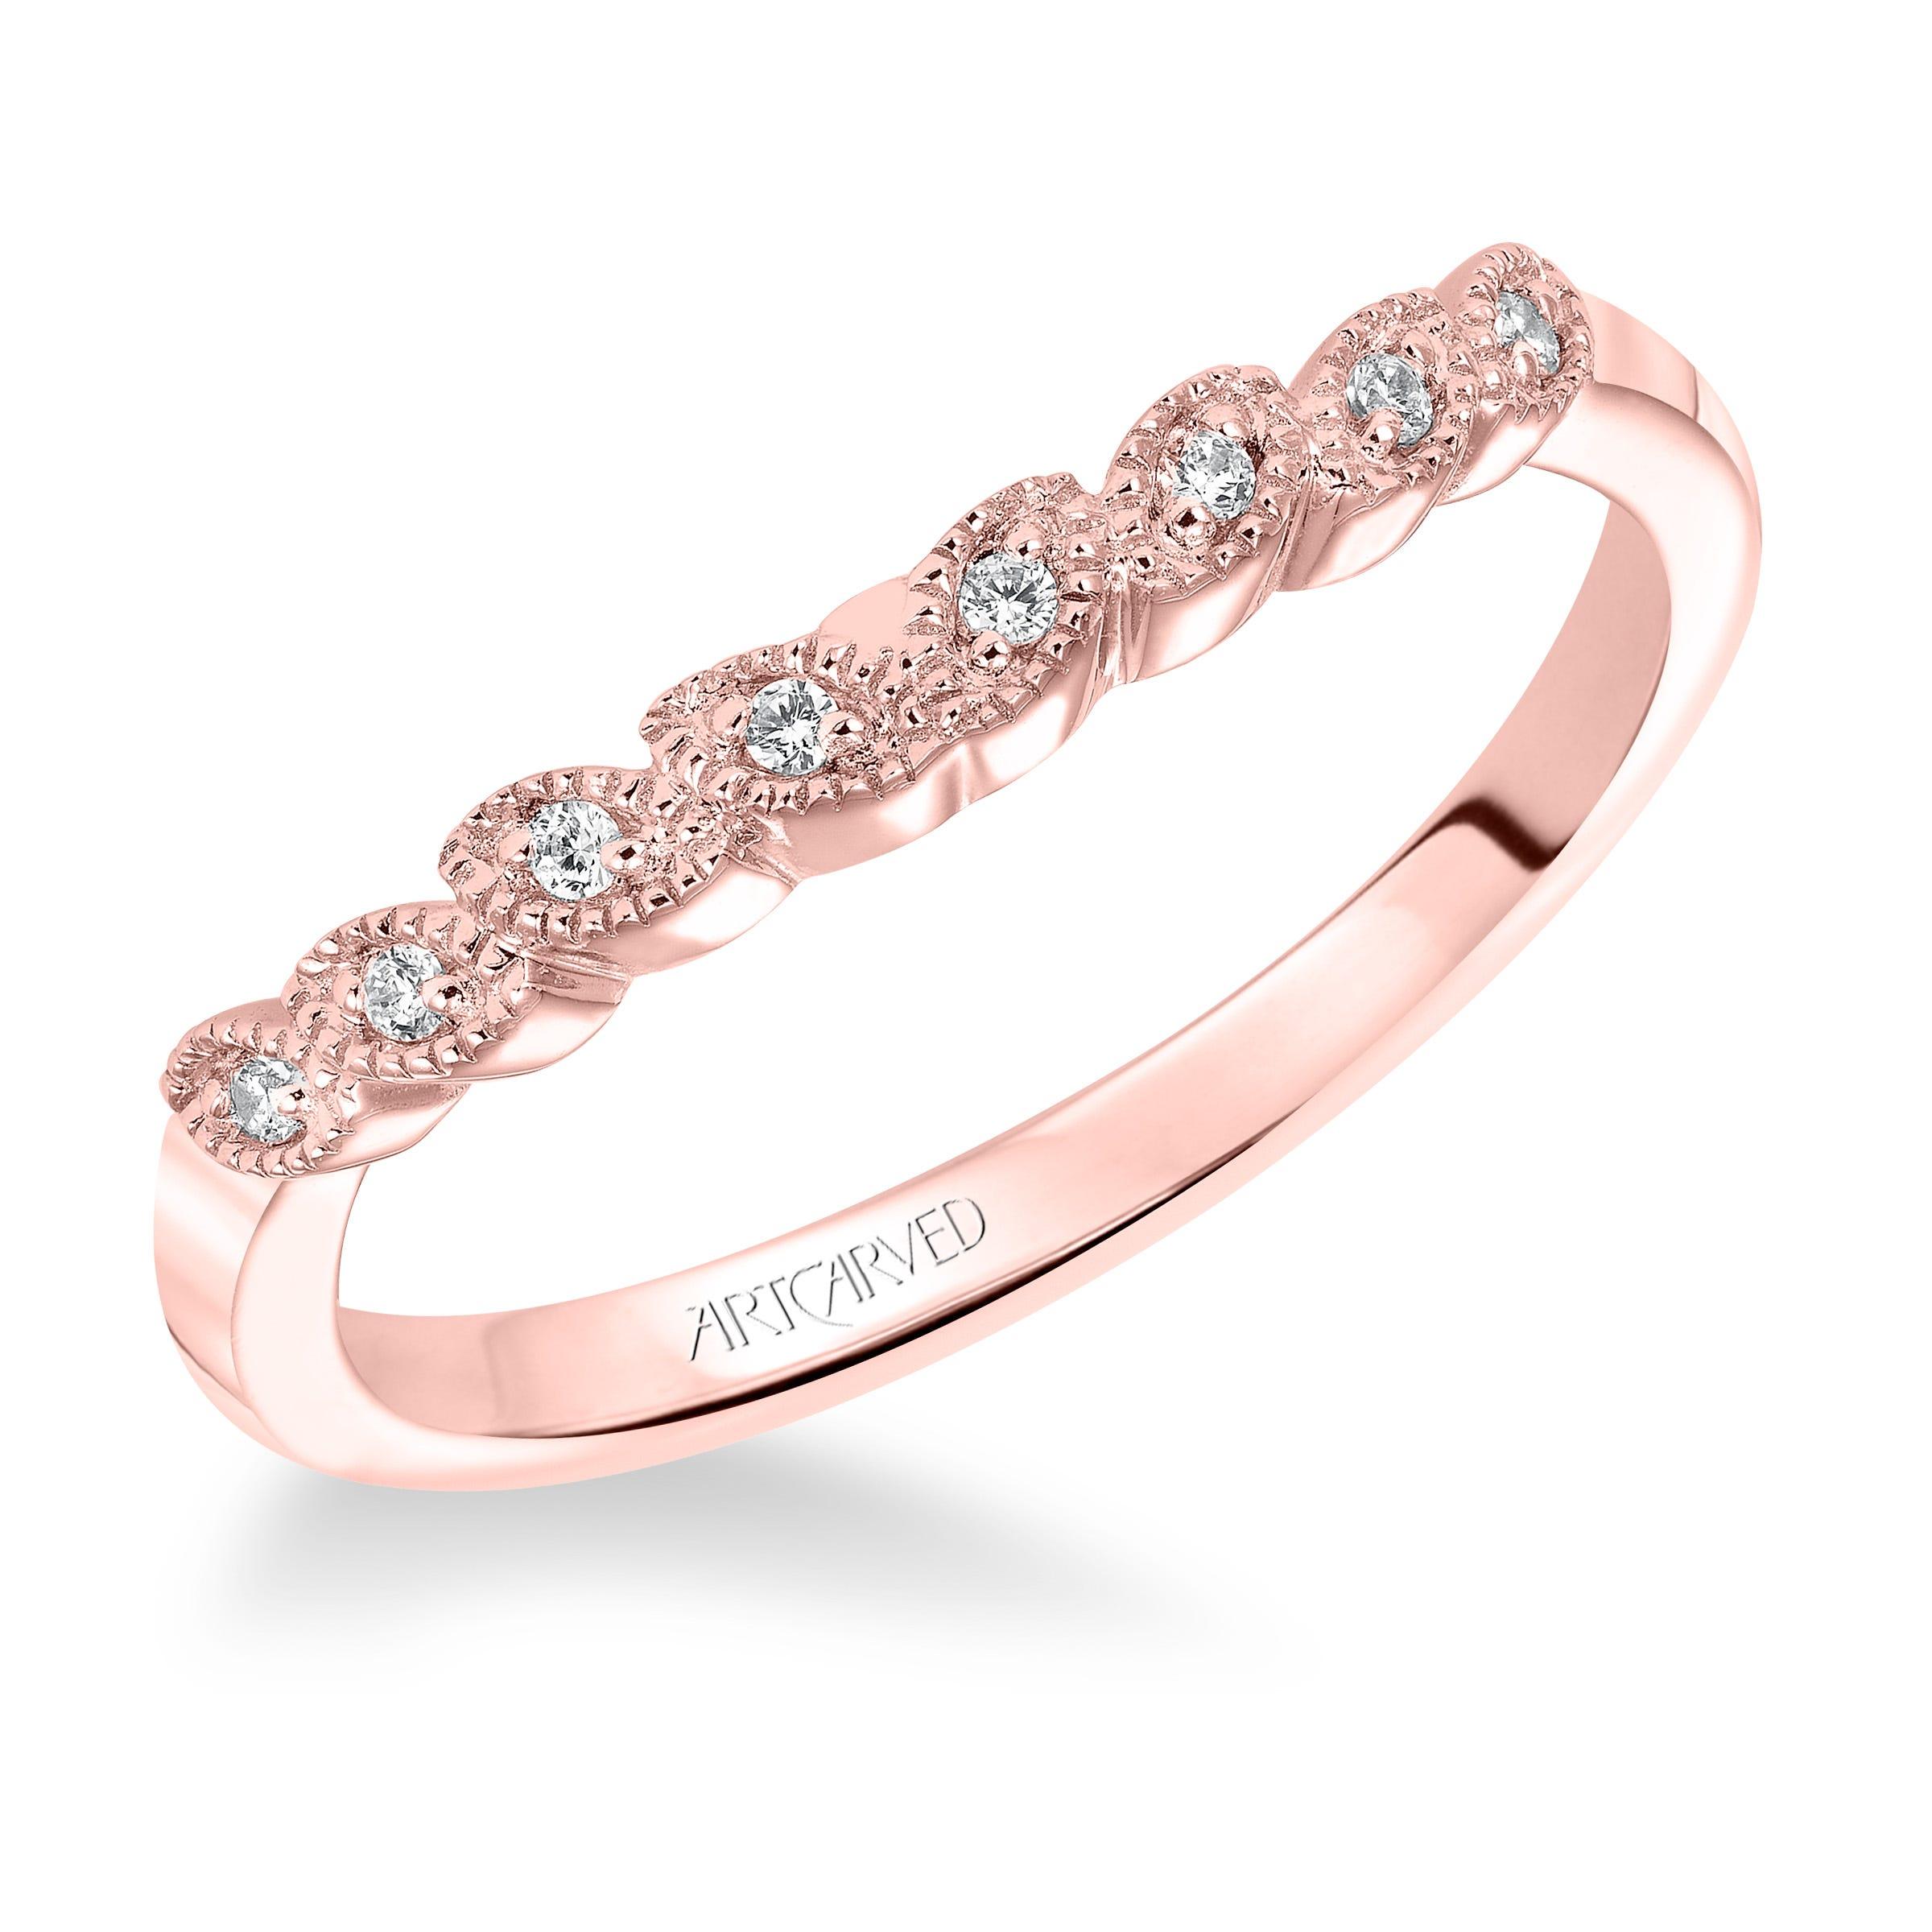 Adeline. ArtCarved® Diamond Wedding Band in 14k Rose Gold